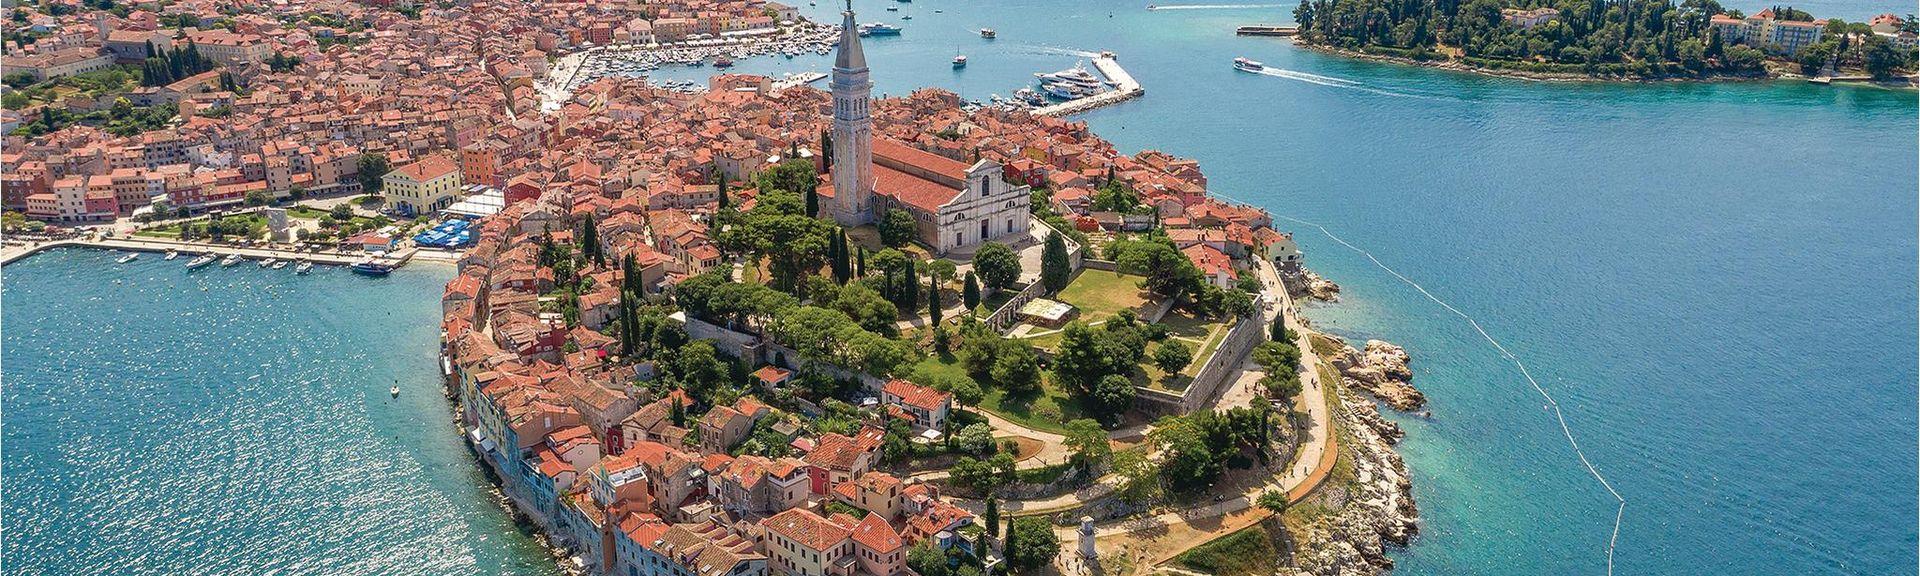 Ježenj, Pazin, Istria (county), Croatia